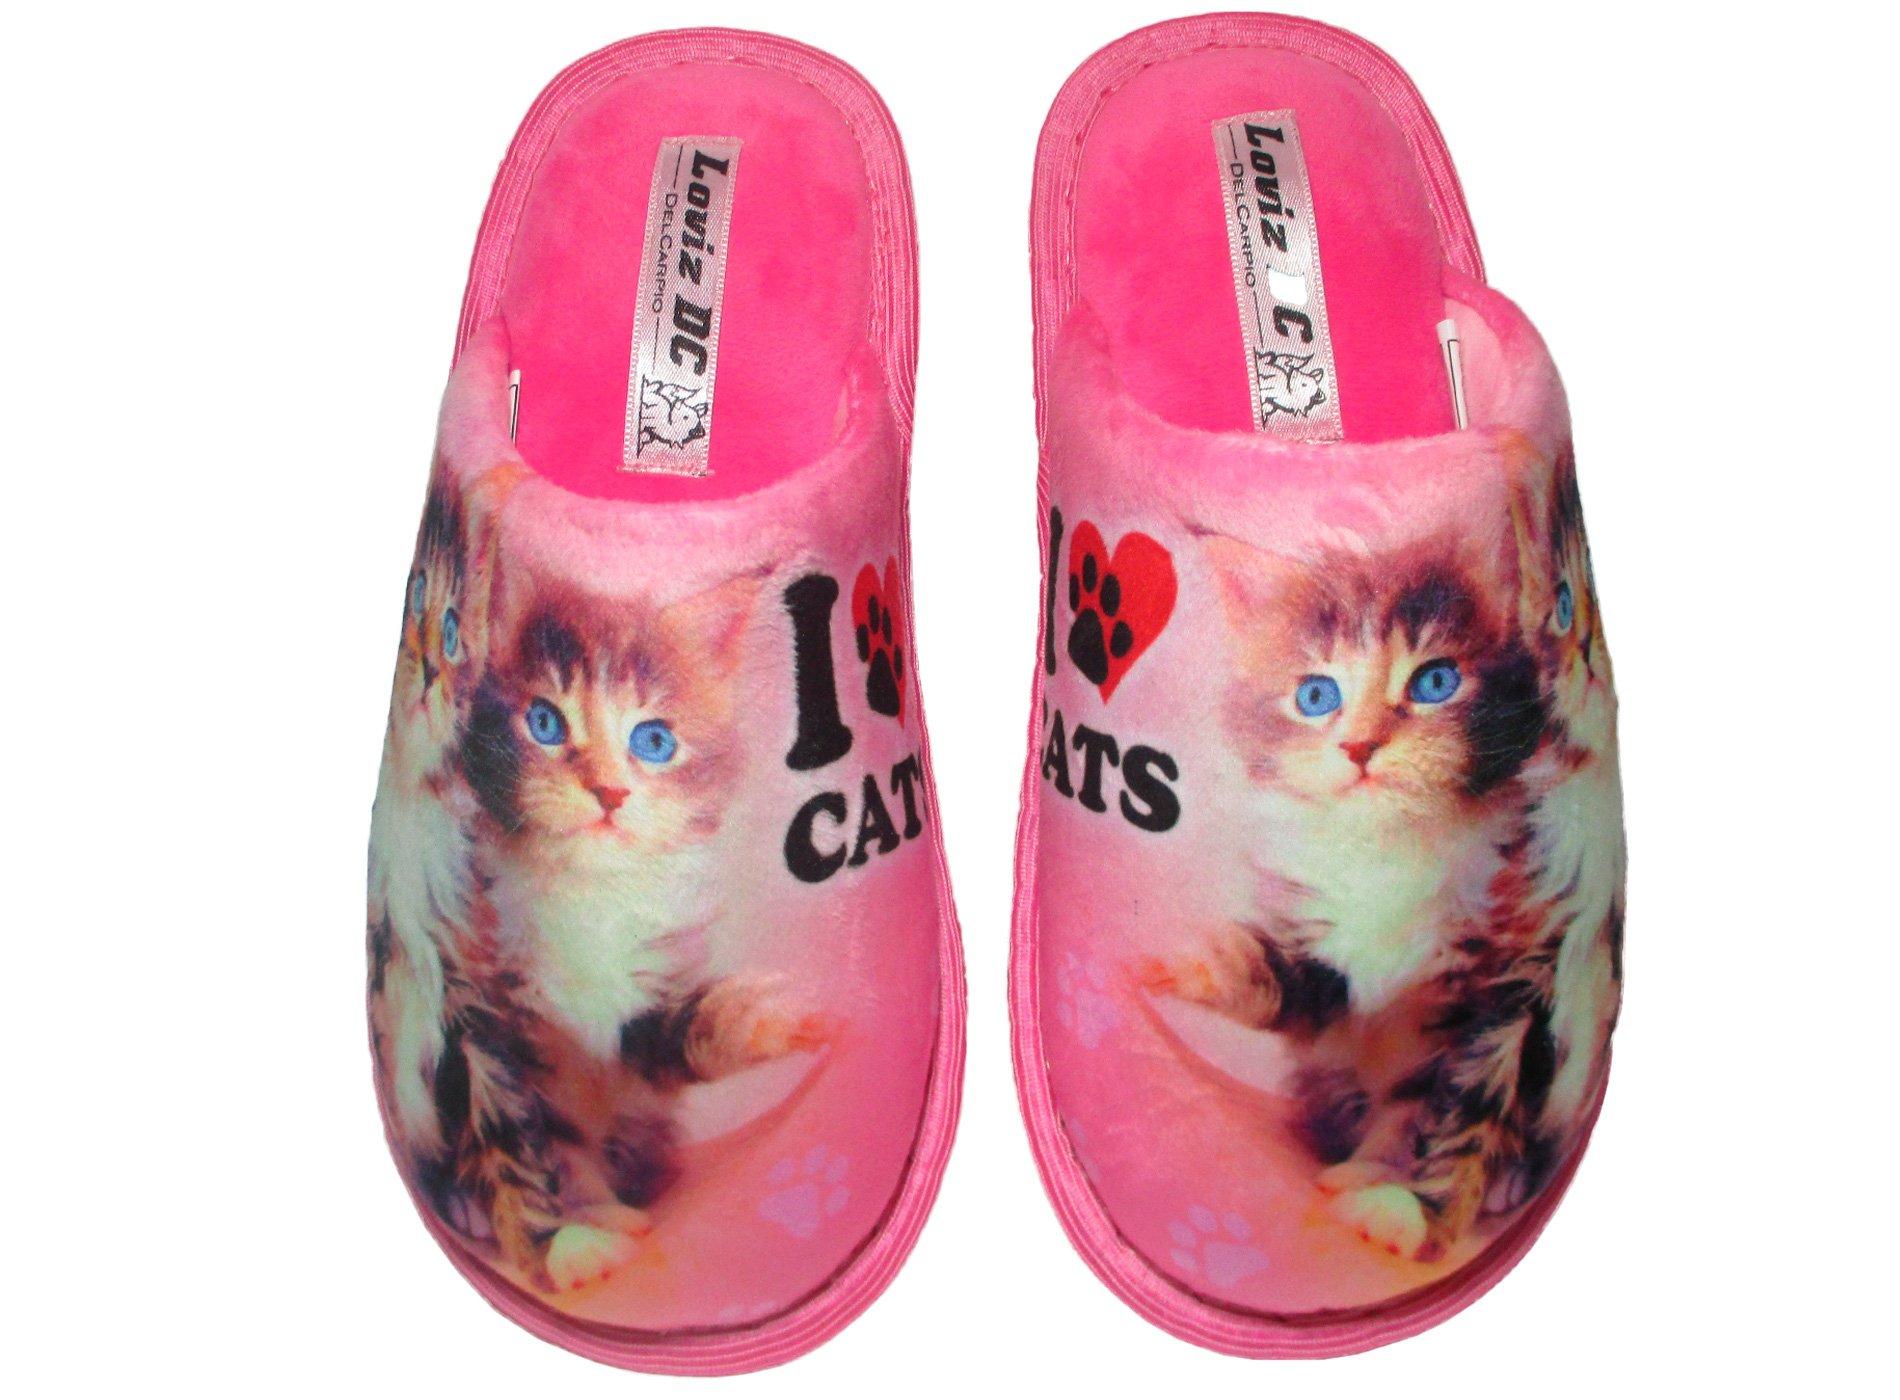 Loviz DC Cute Cat 3D Print Slippers Scuff Warm Velvet Non-Slip Sole Indoor Outdoor (7-8 (B) M, Love Cats)